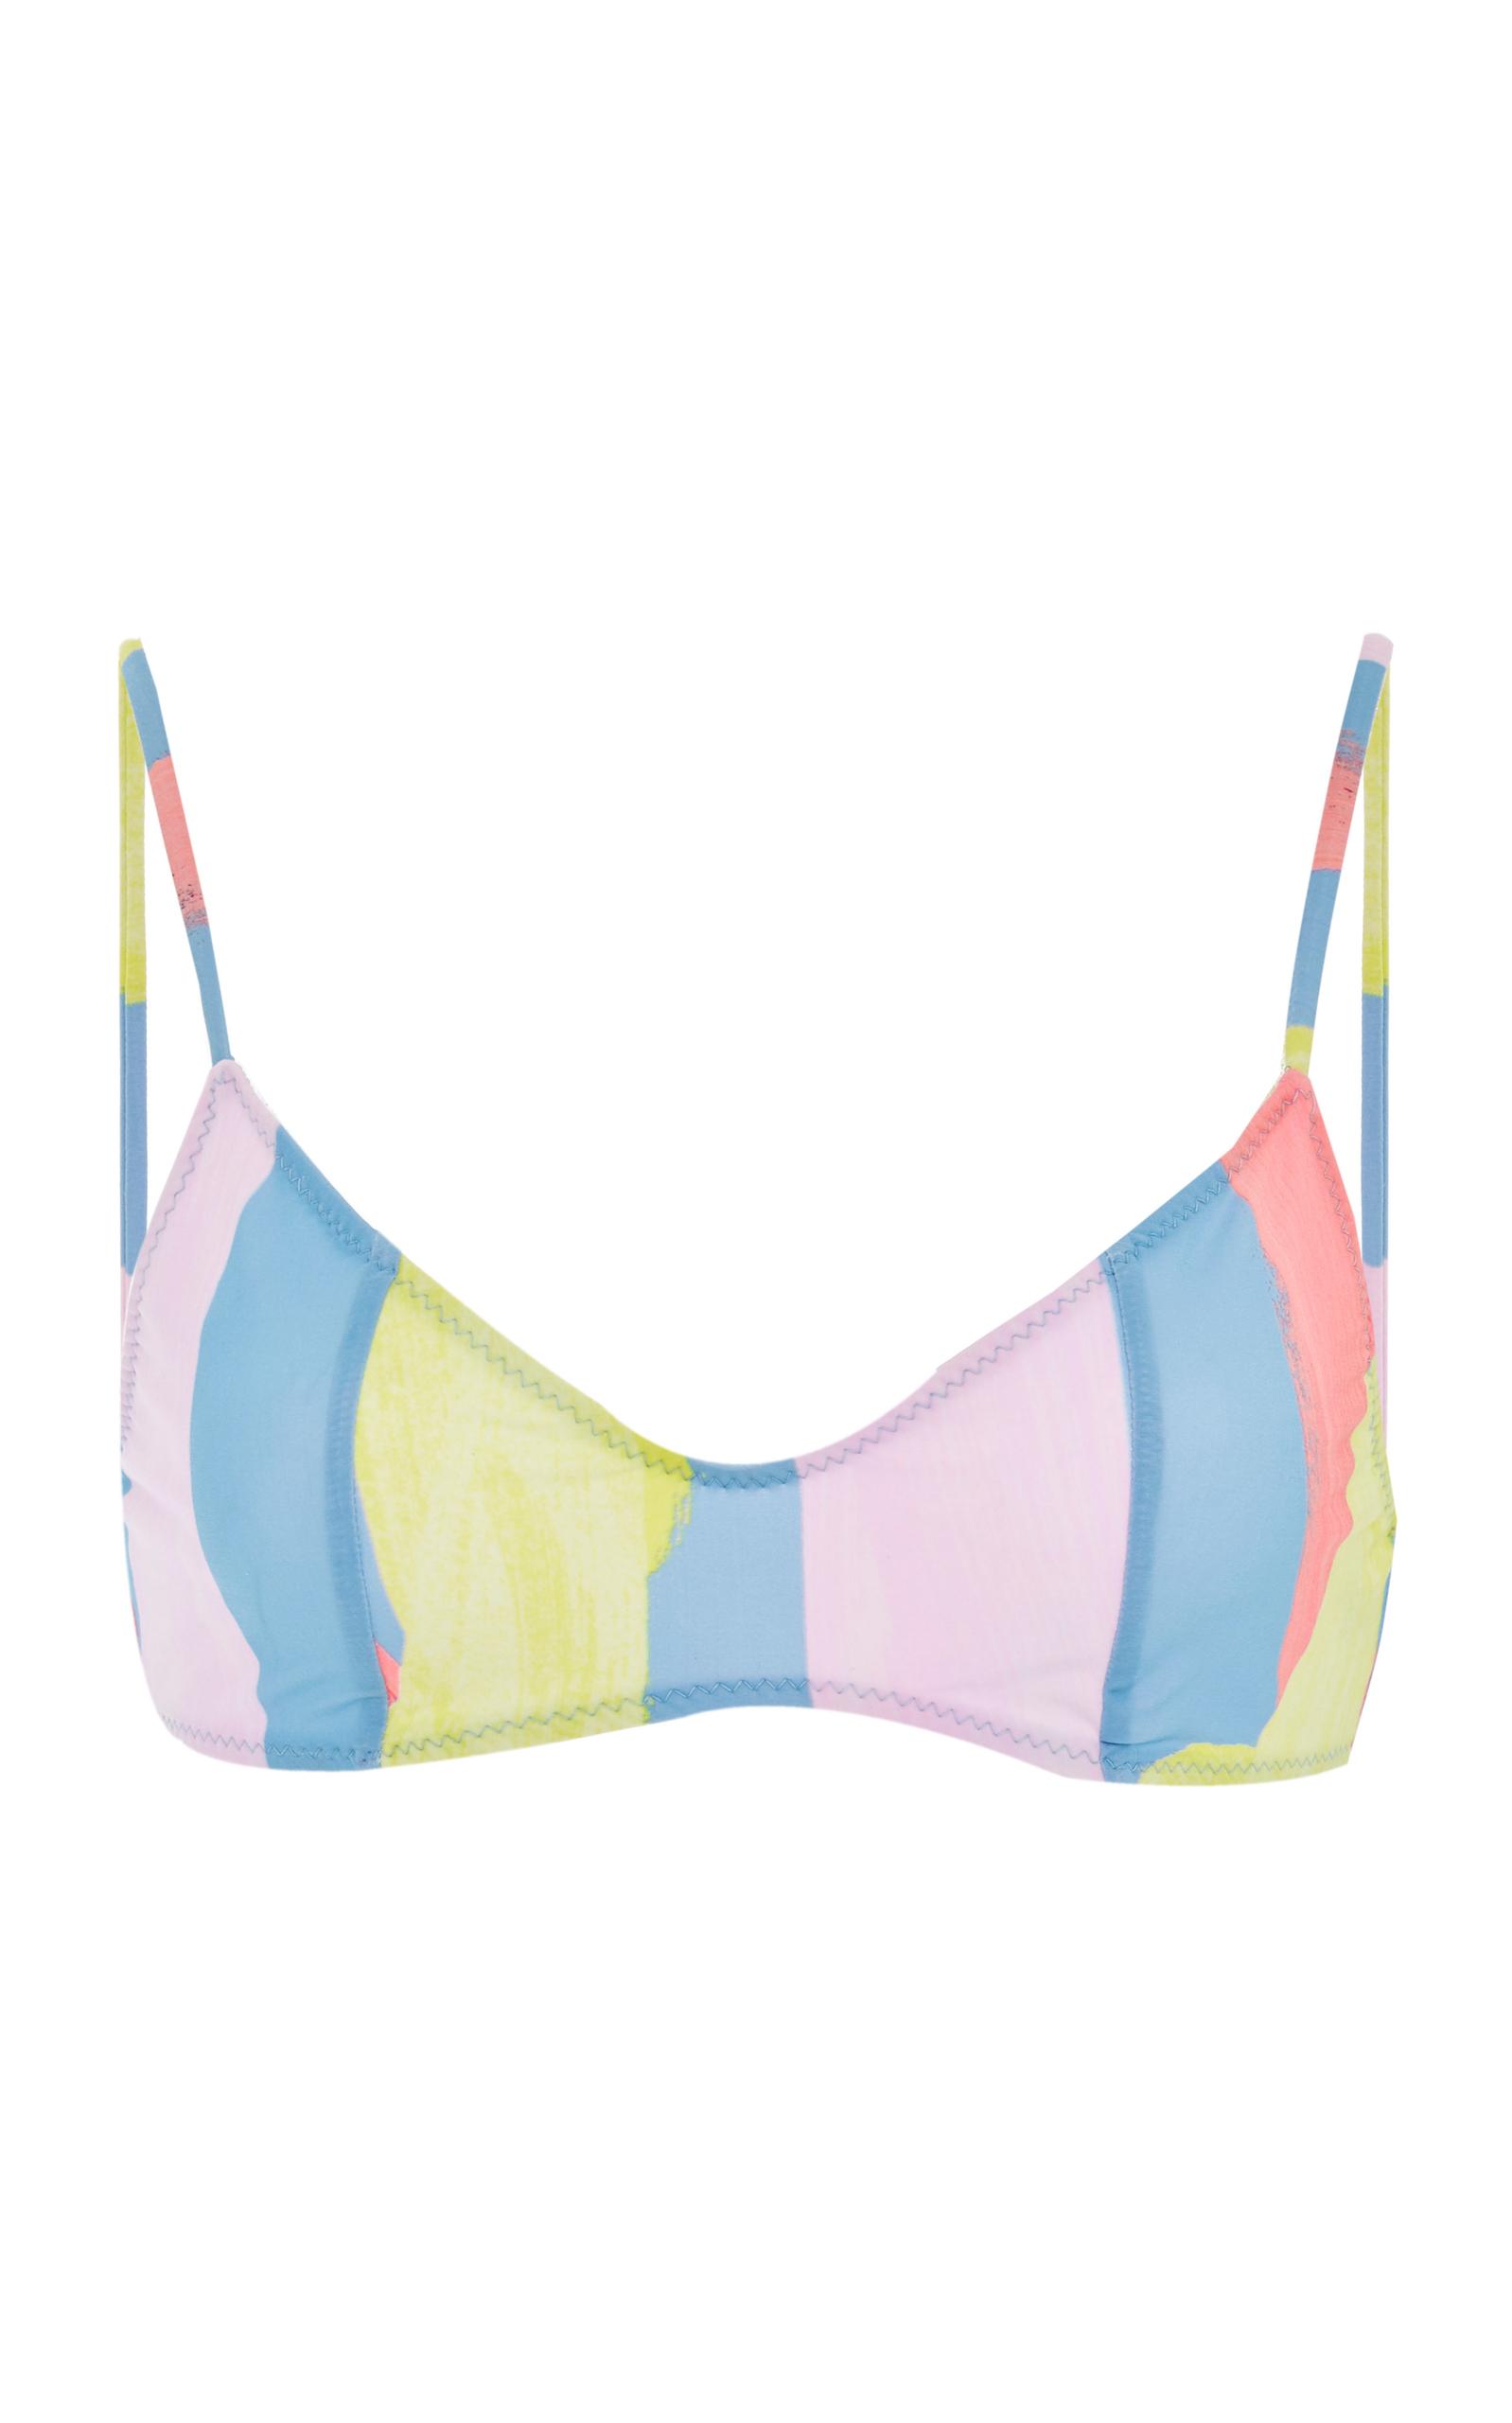 Araks Elsa Two Tone Bikini Top Vente Livraison Rapide Pas Cher QeBgG2